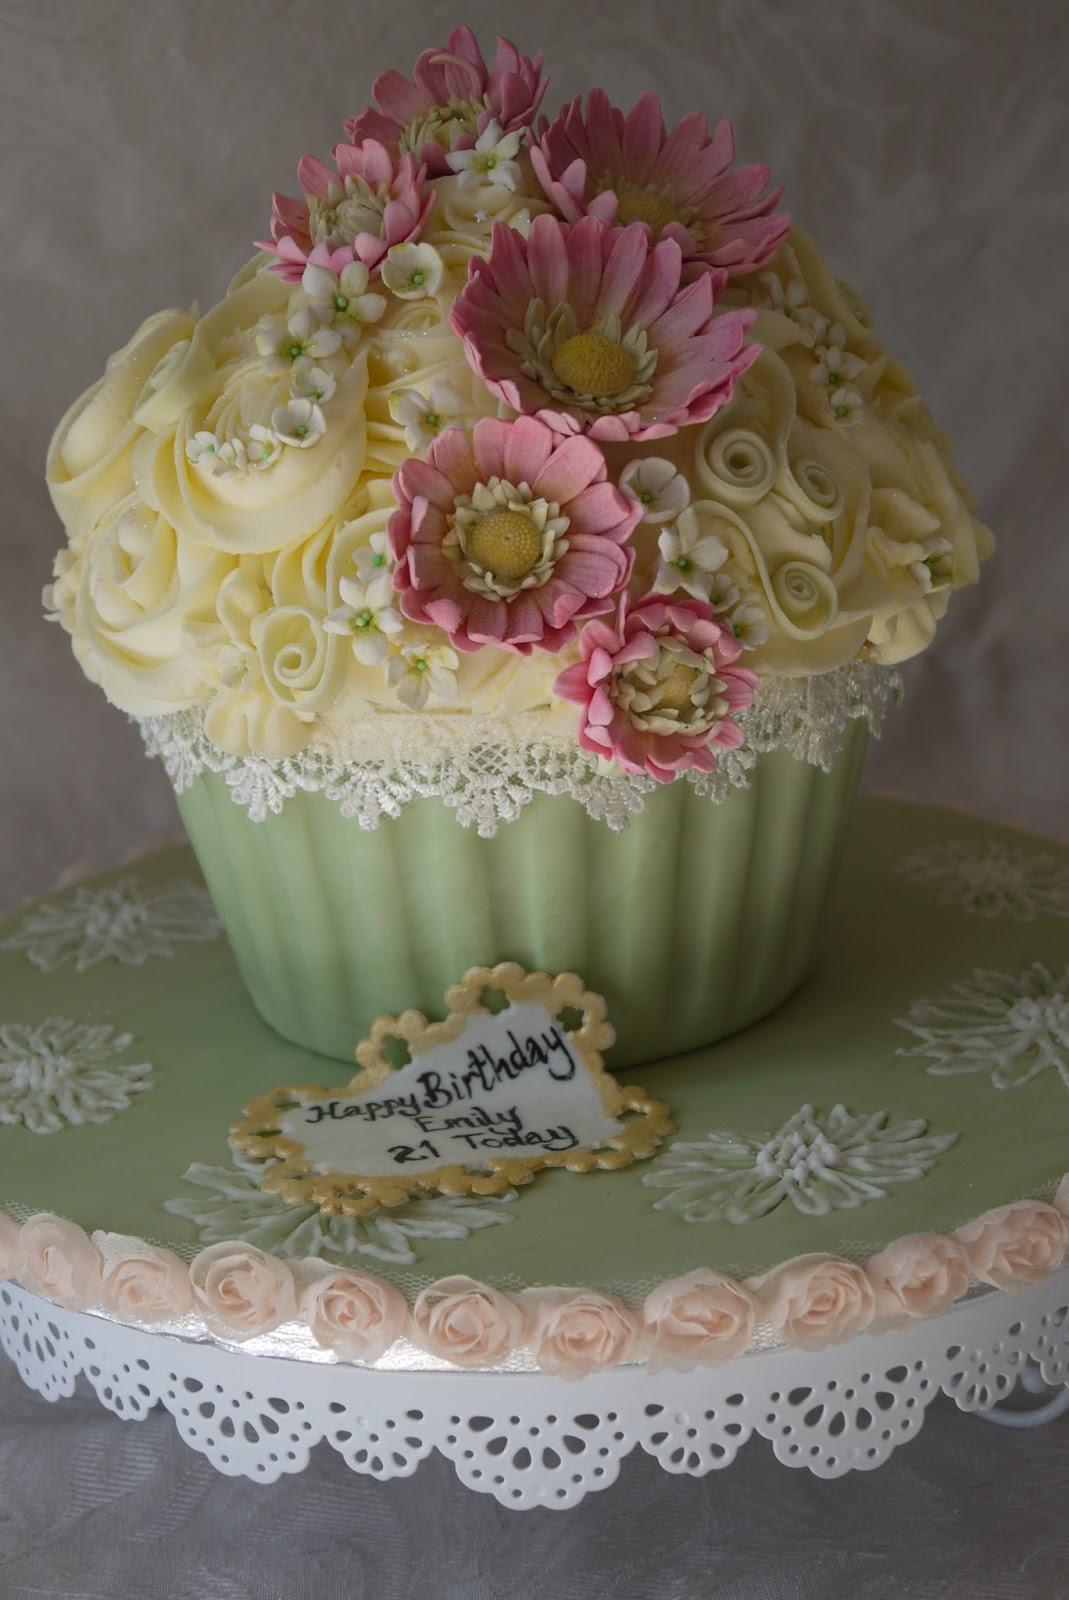 Scrummy Mummy S Cakes 21st Birthday Gerbera Giant Cupcake